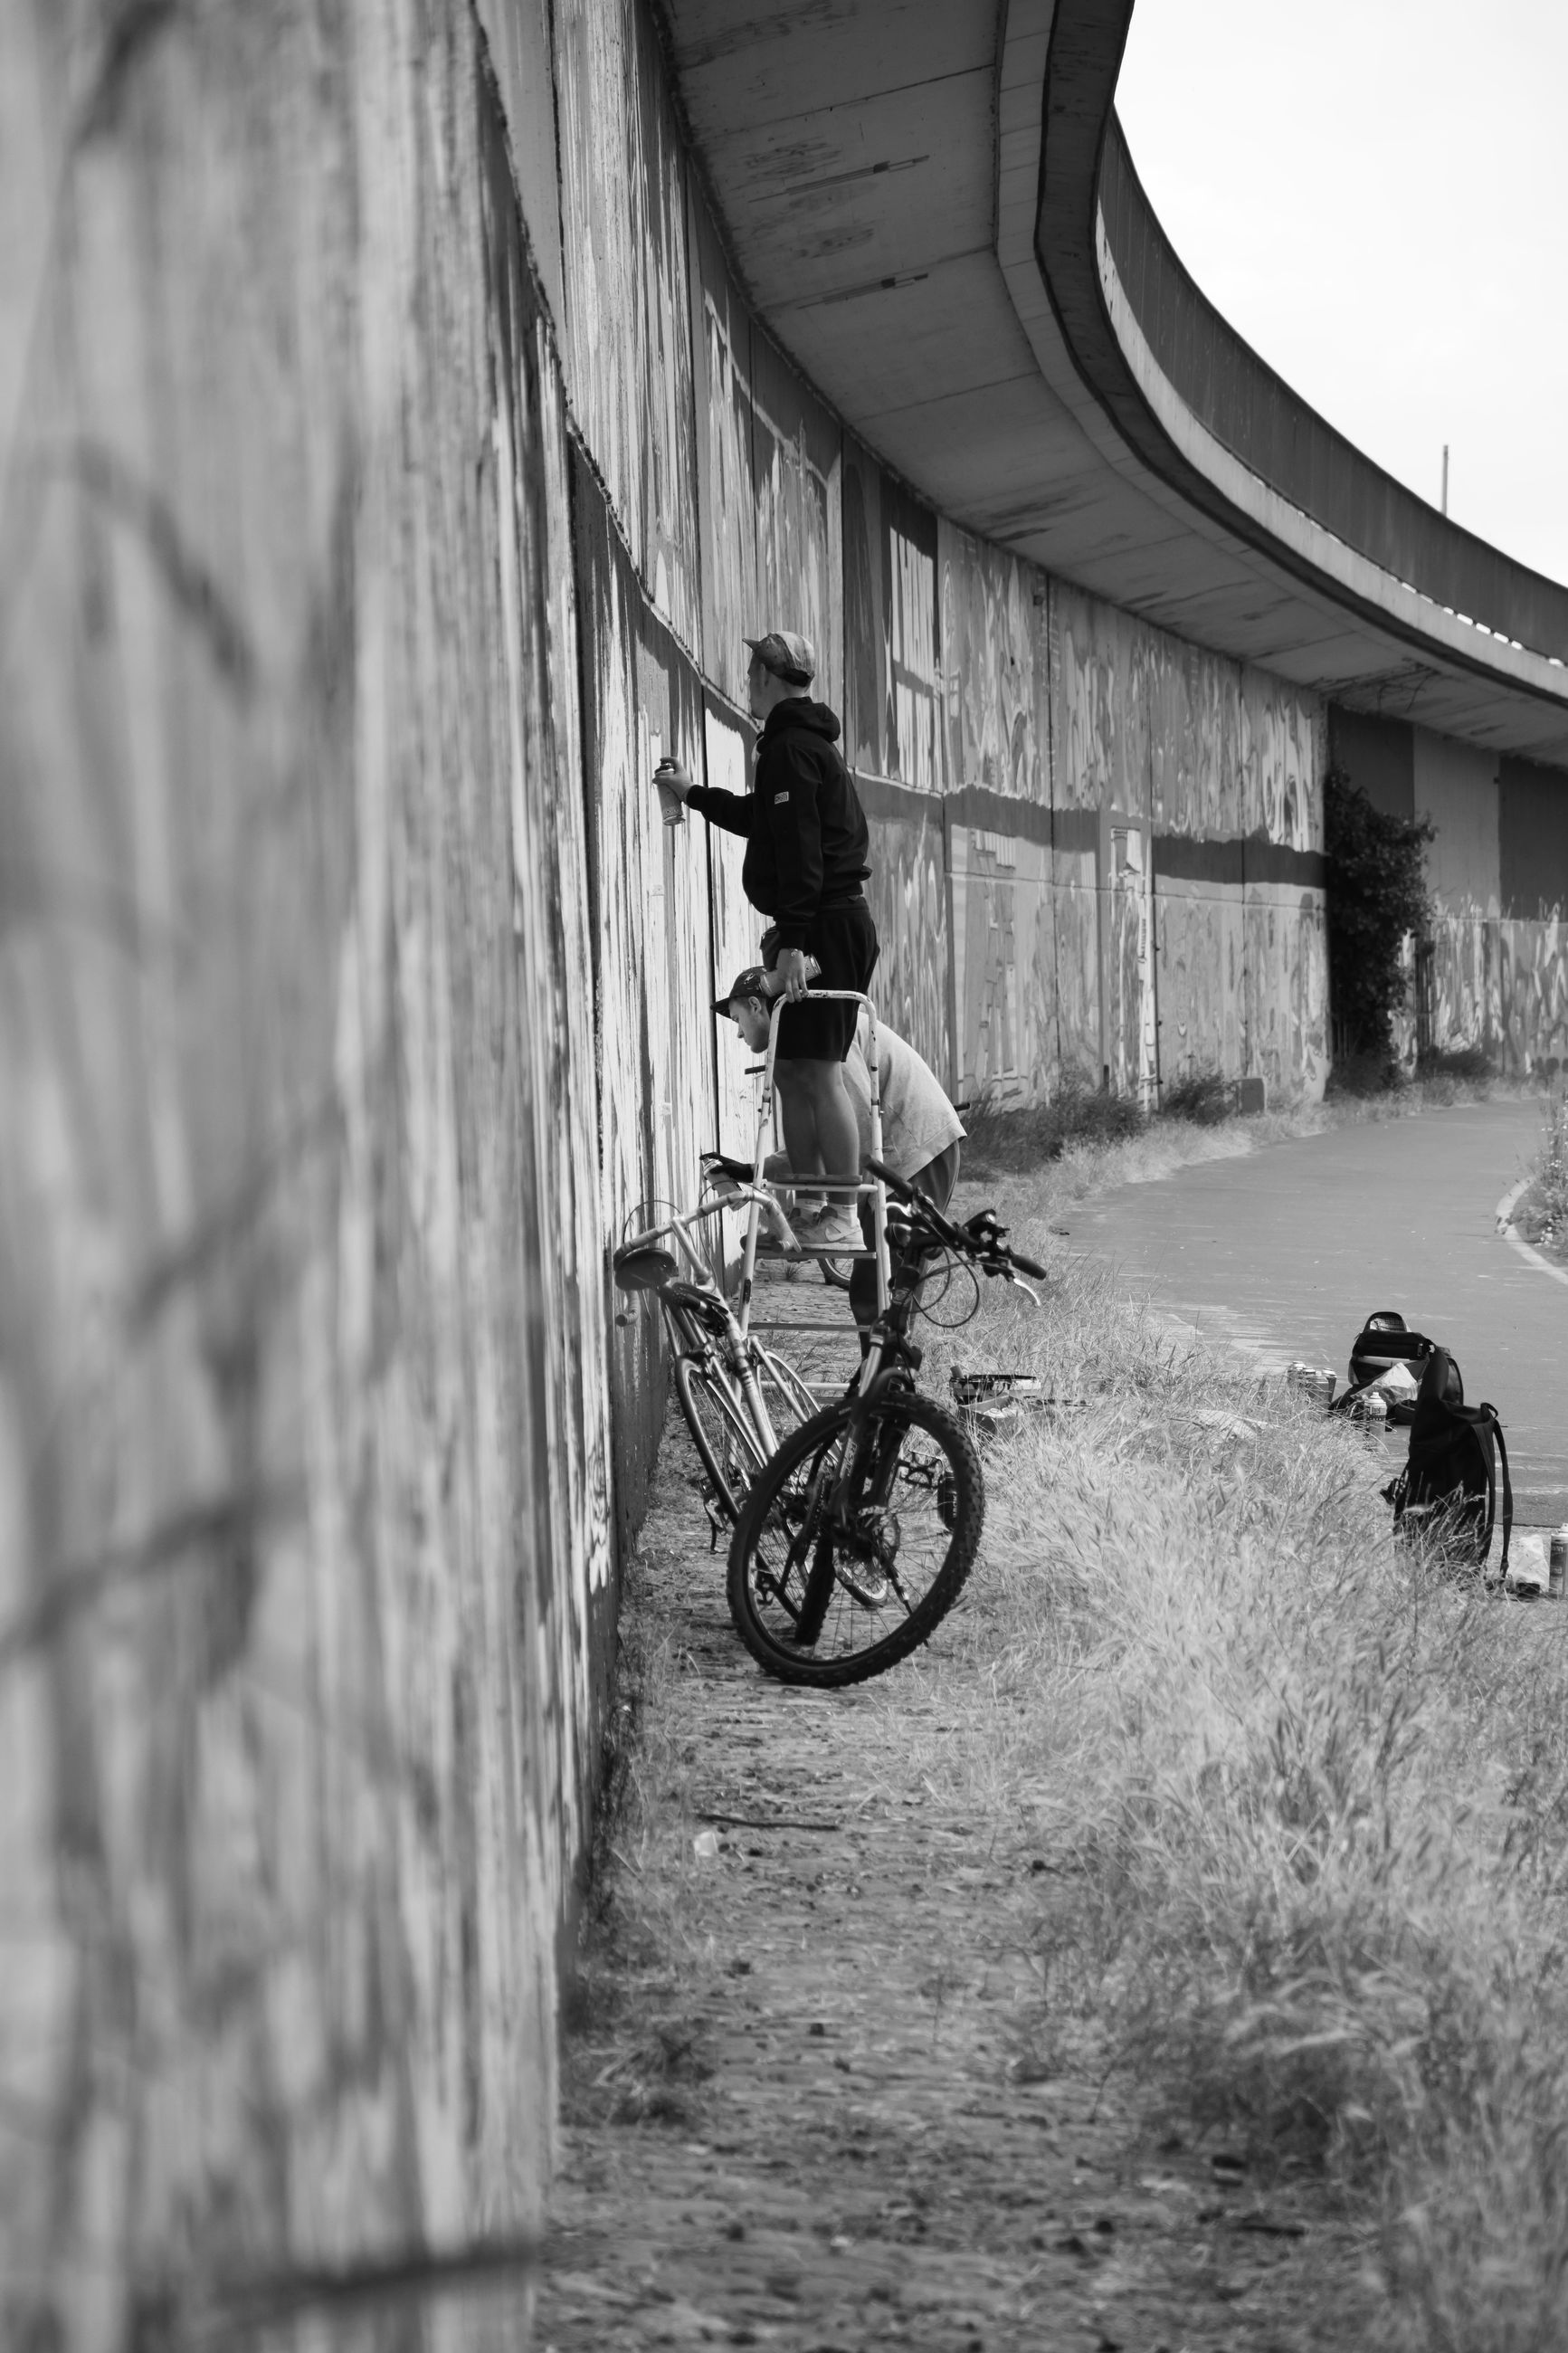 MAN RIDING BICYCLE ON MOTORCYCLE